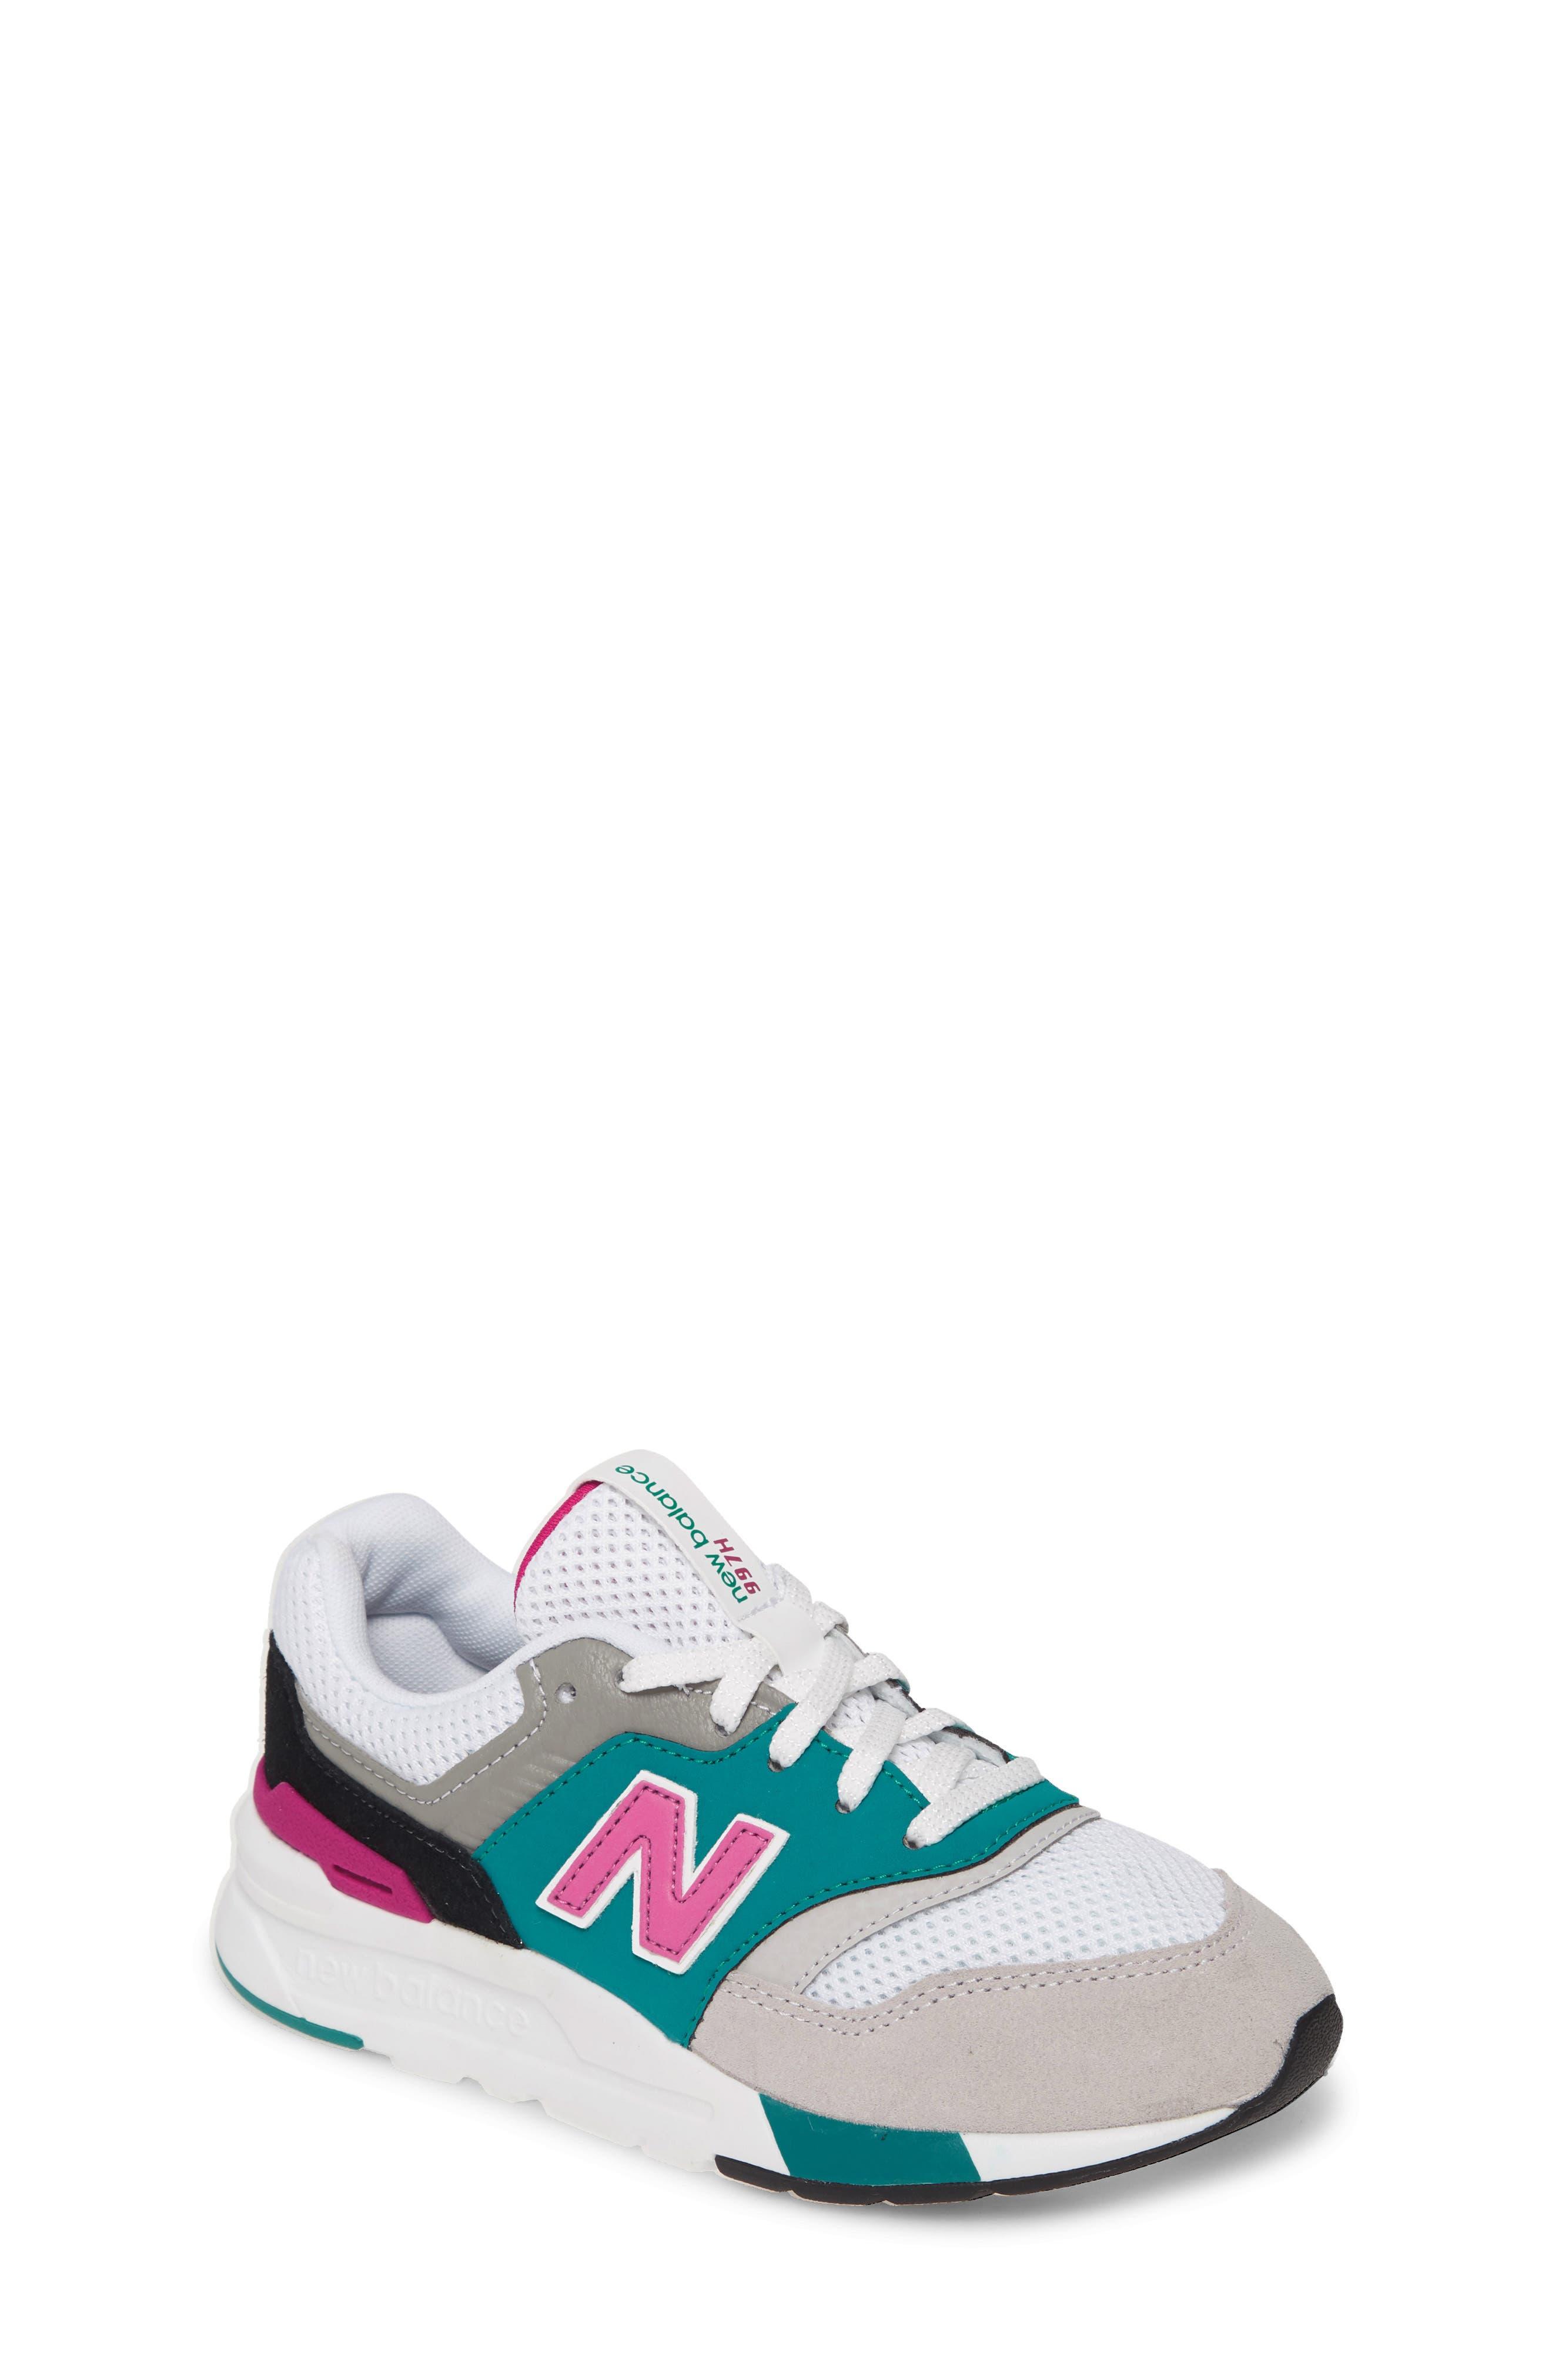 Toddler girl new balance sneakers